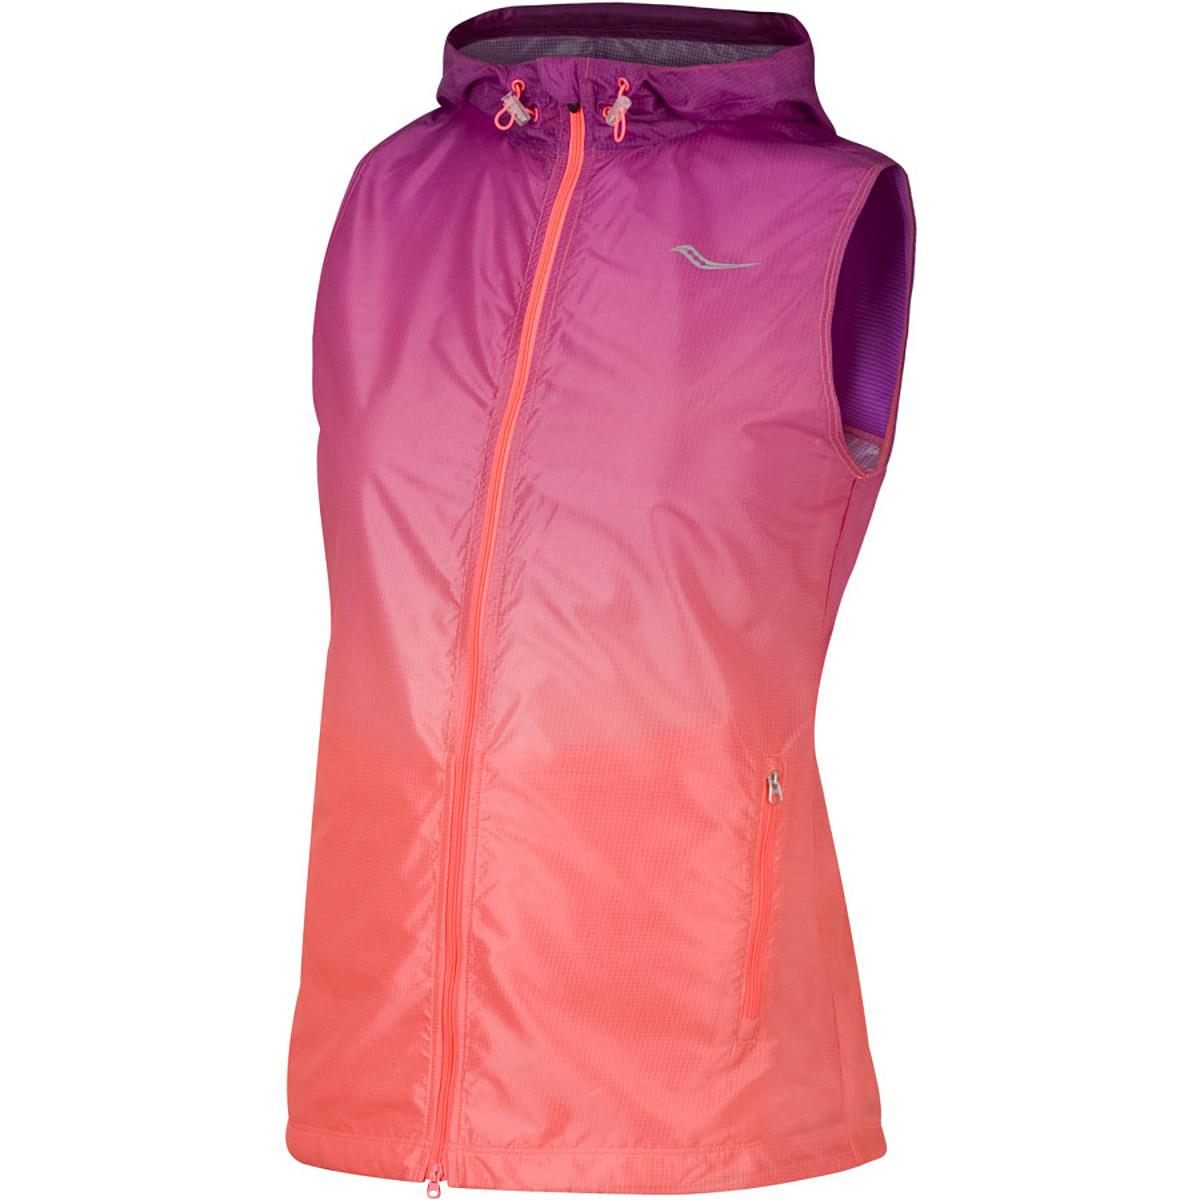 Saucony Packable Fade Vest